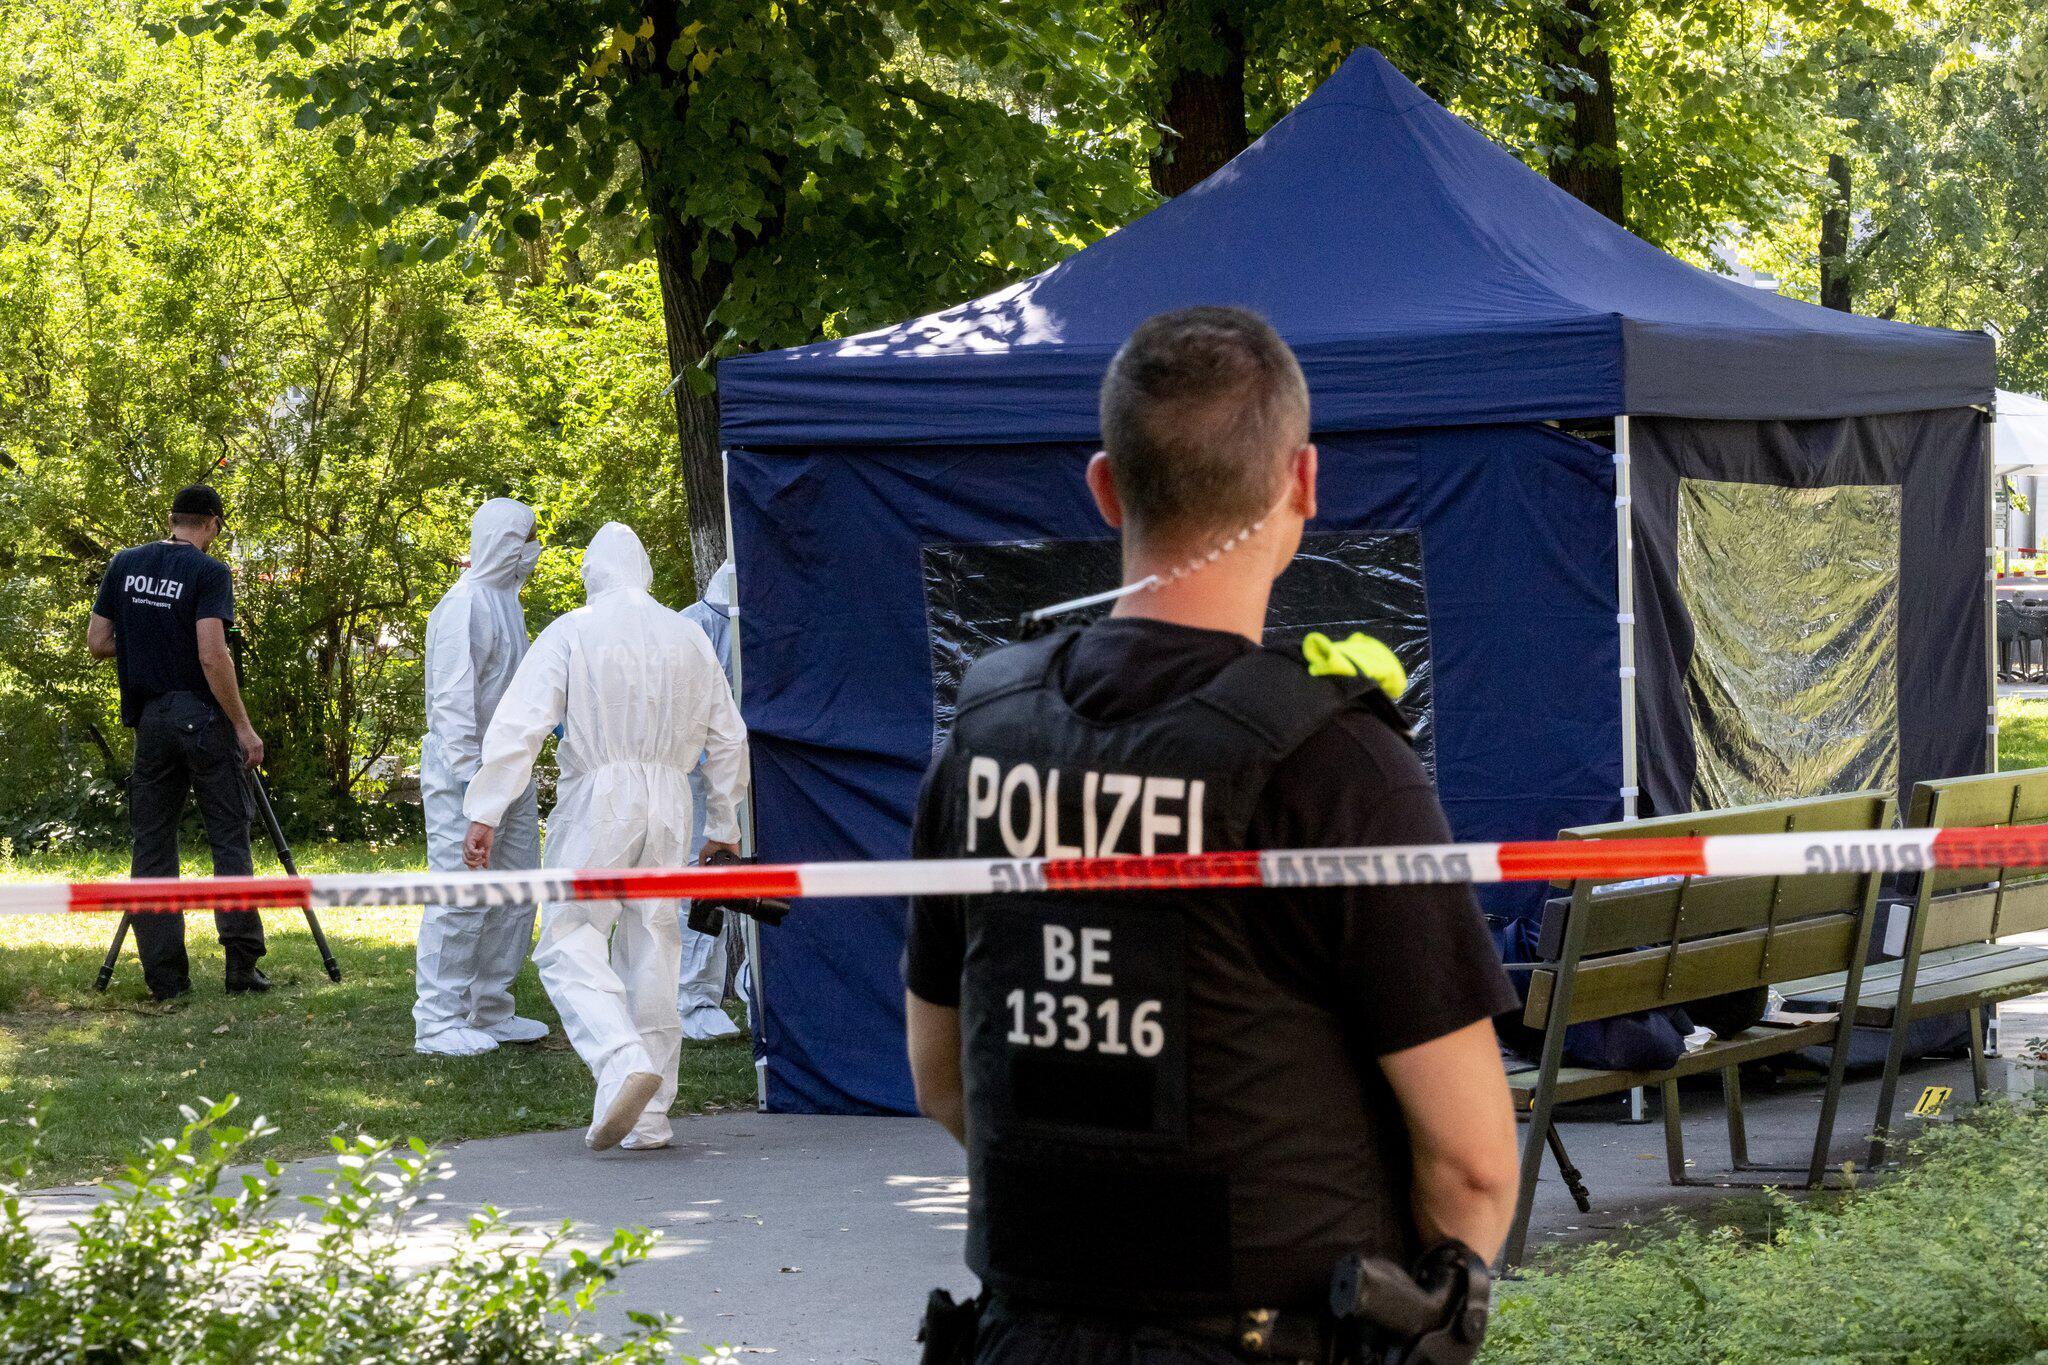 Bild zu Mord an Georgier in Berlin